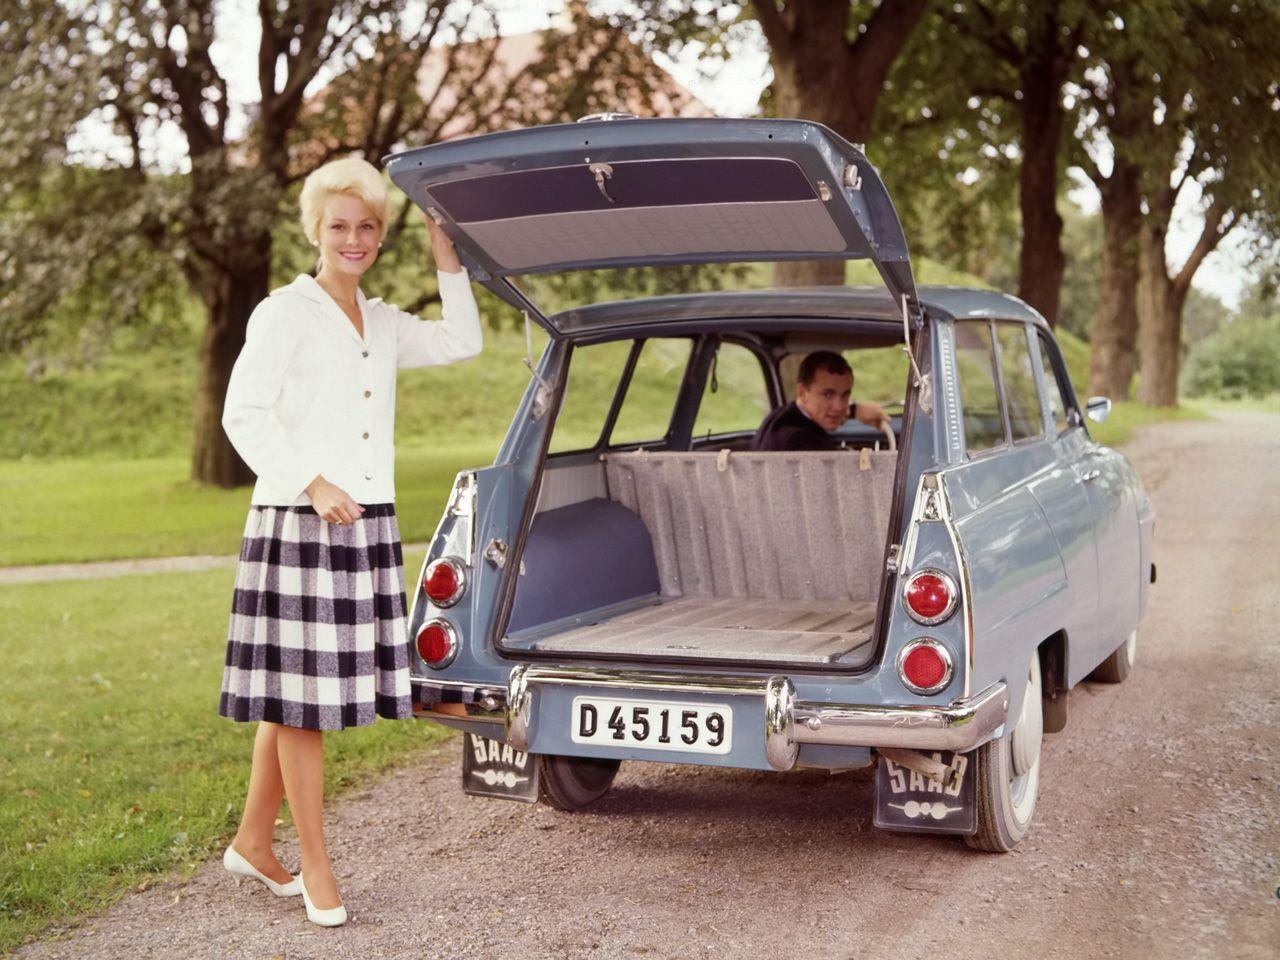 1959 1978 Saab 95 1960 3 1280x960 Wallpaper Saab Automobile Classic Chevy Trucks Chevy Truck Models